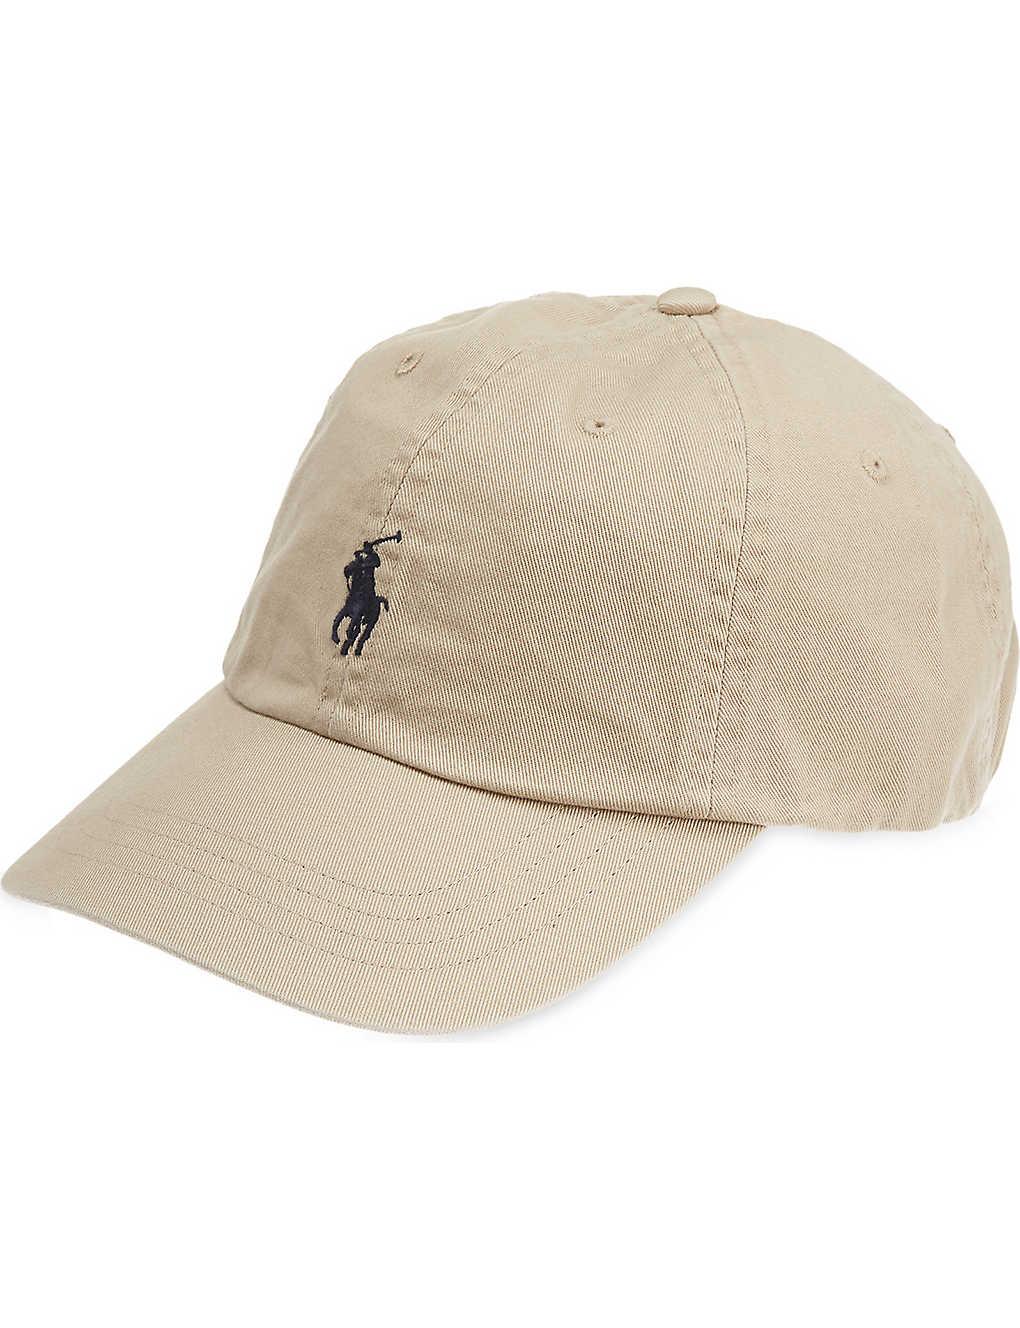 polo ralph lauren classic pony baseball cap selfridges com